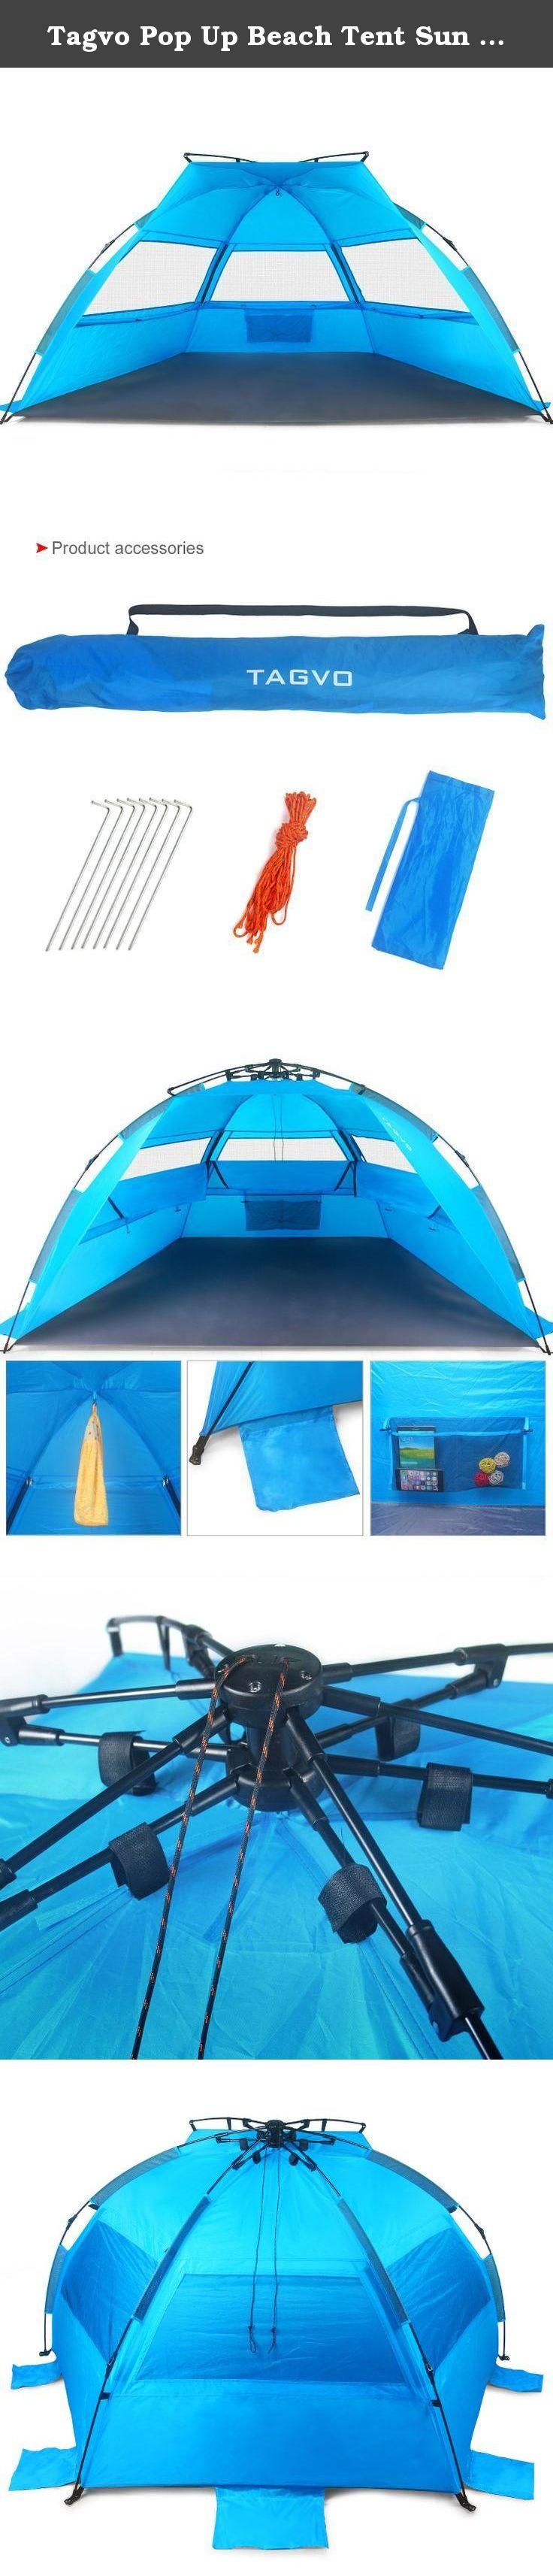 Tagvo Pop Up Beach Tent Sun Shelter Easy Set Up Tear Down Fiberglass Frame Lightweight 4.7lb Compact Instant Beach Canopy UPF 50+ Sun Protection 3 Zipper ...  sc 1 st  Pinterest & Tagvo Pop Up Beach Tent Sun Shelter Easy Set Up Tear Down ...